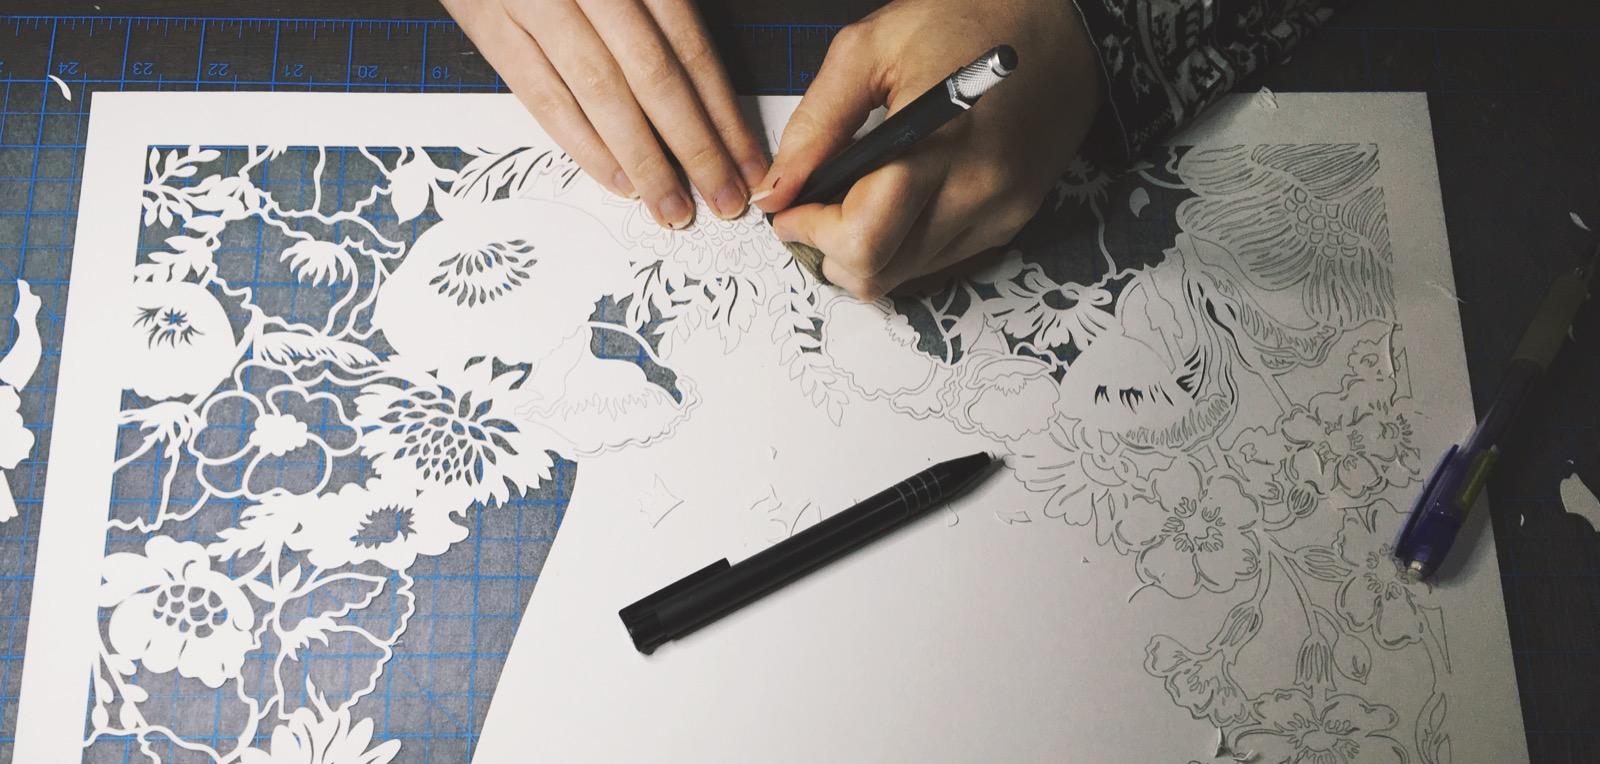 papercutting ketubah